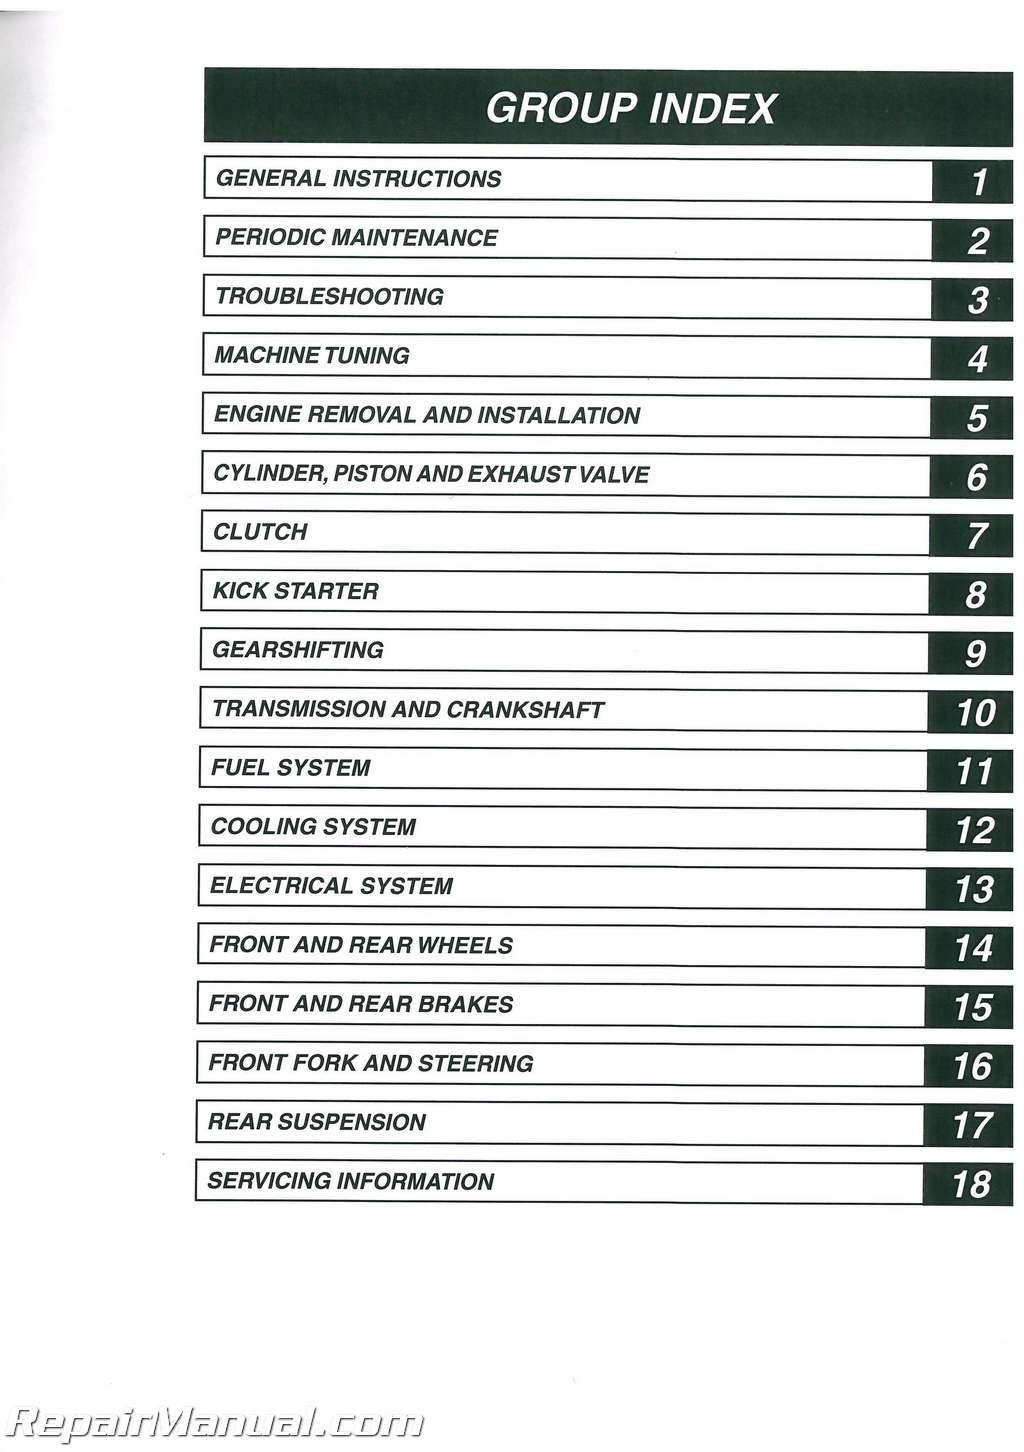 1982 suzuki rm250 fork rebuild instructions Array - 2003 suzuki rm125k3  motorcycle service manual owners manual rh repairmanual ...